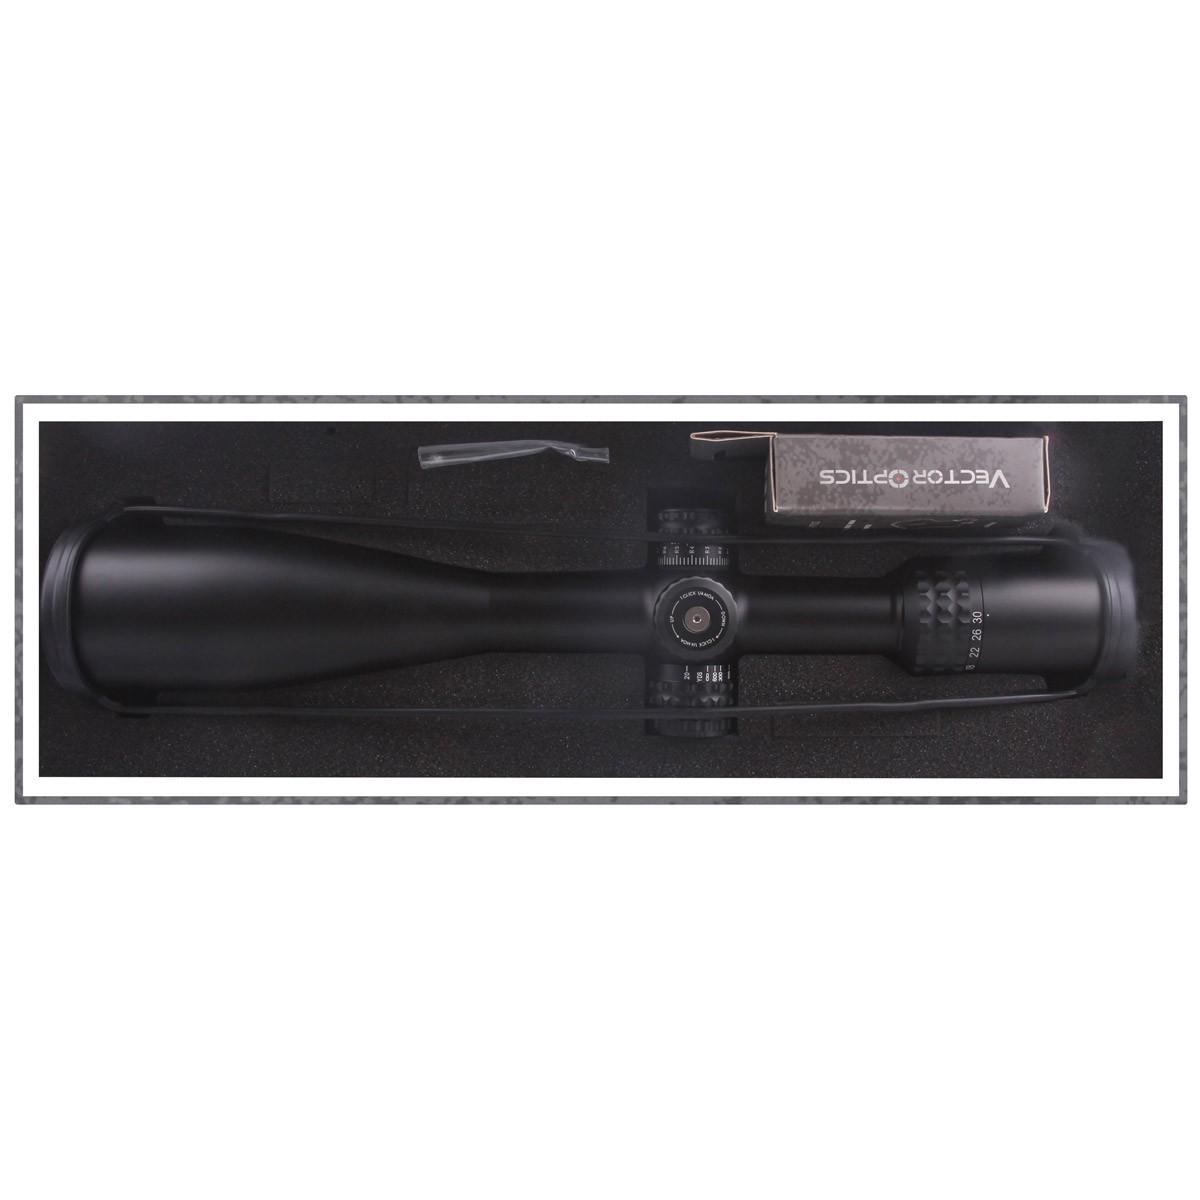 Aston 5-30x56 Riflescope